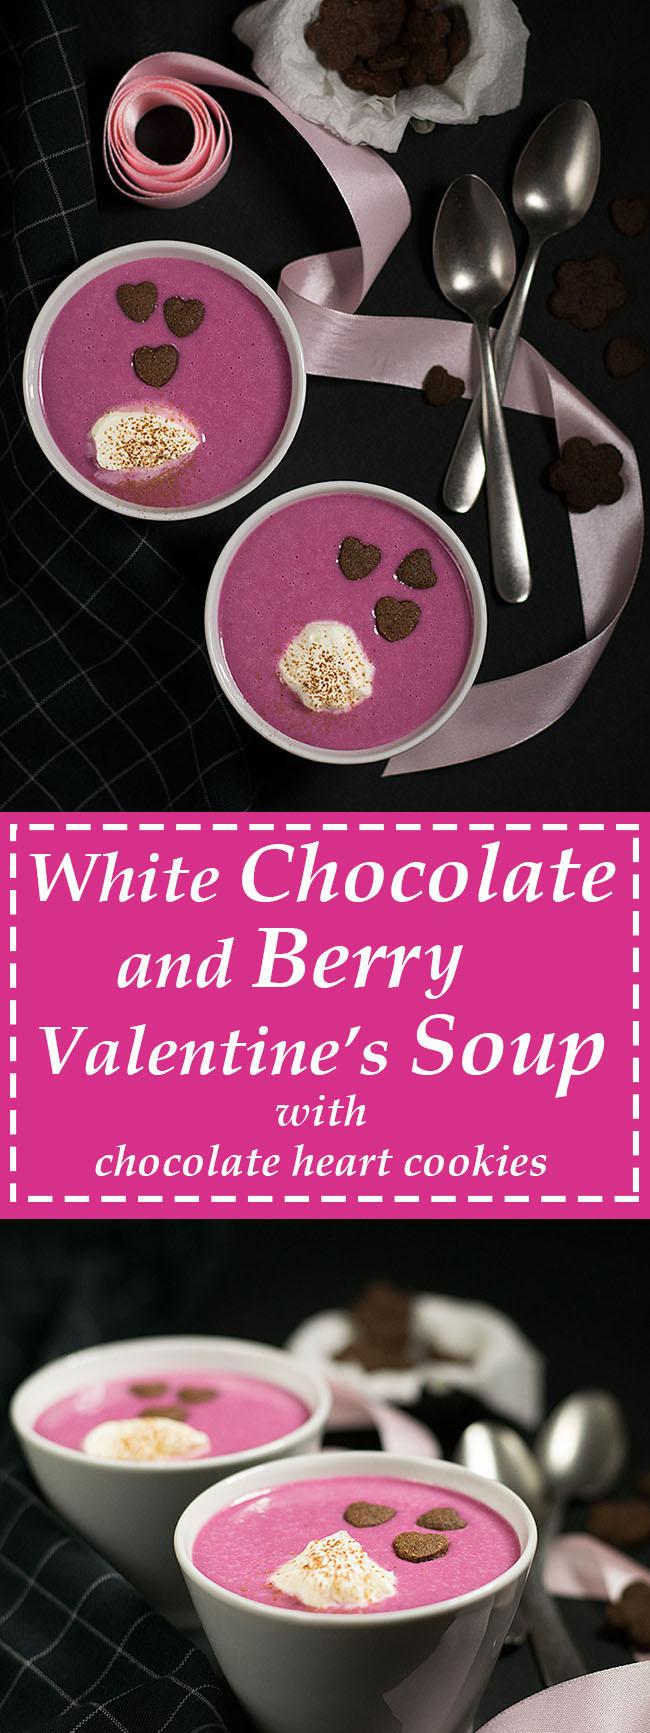 white chocolate & berry Valentine's soup 6